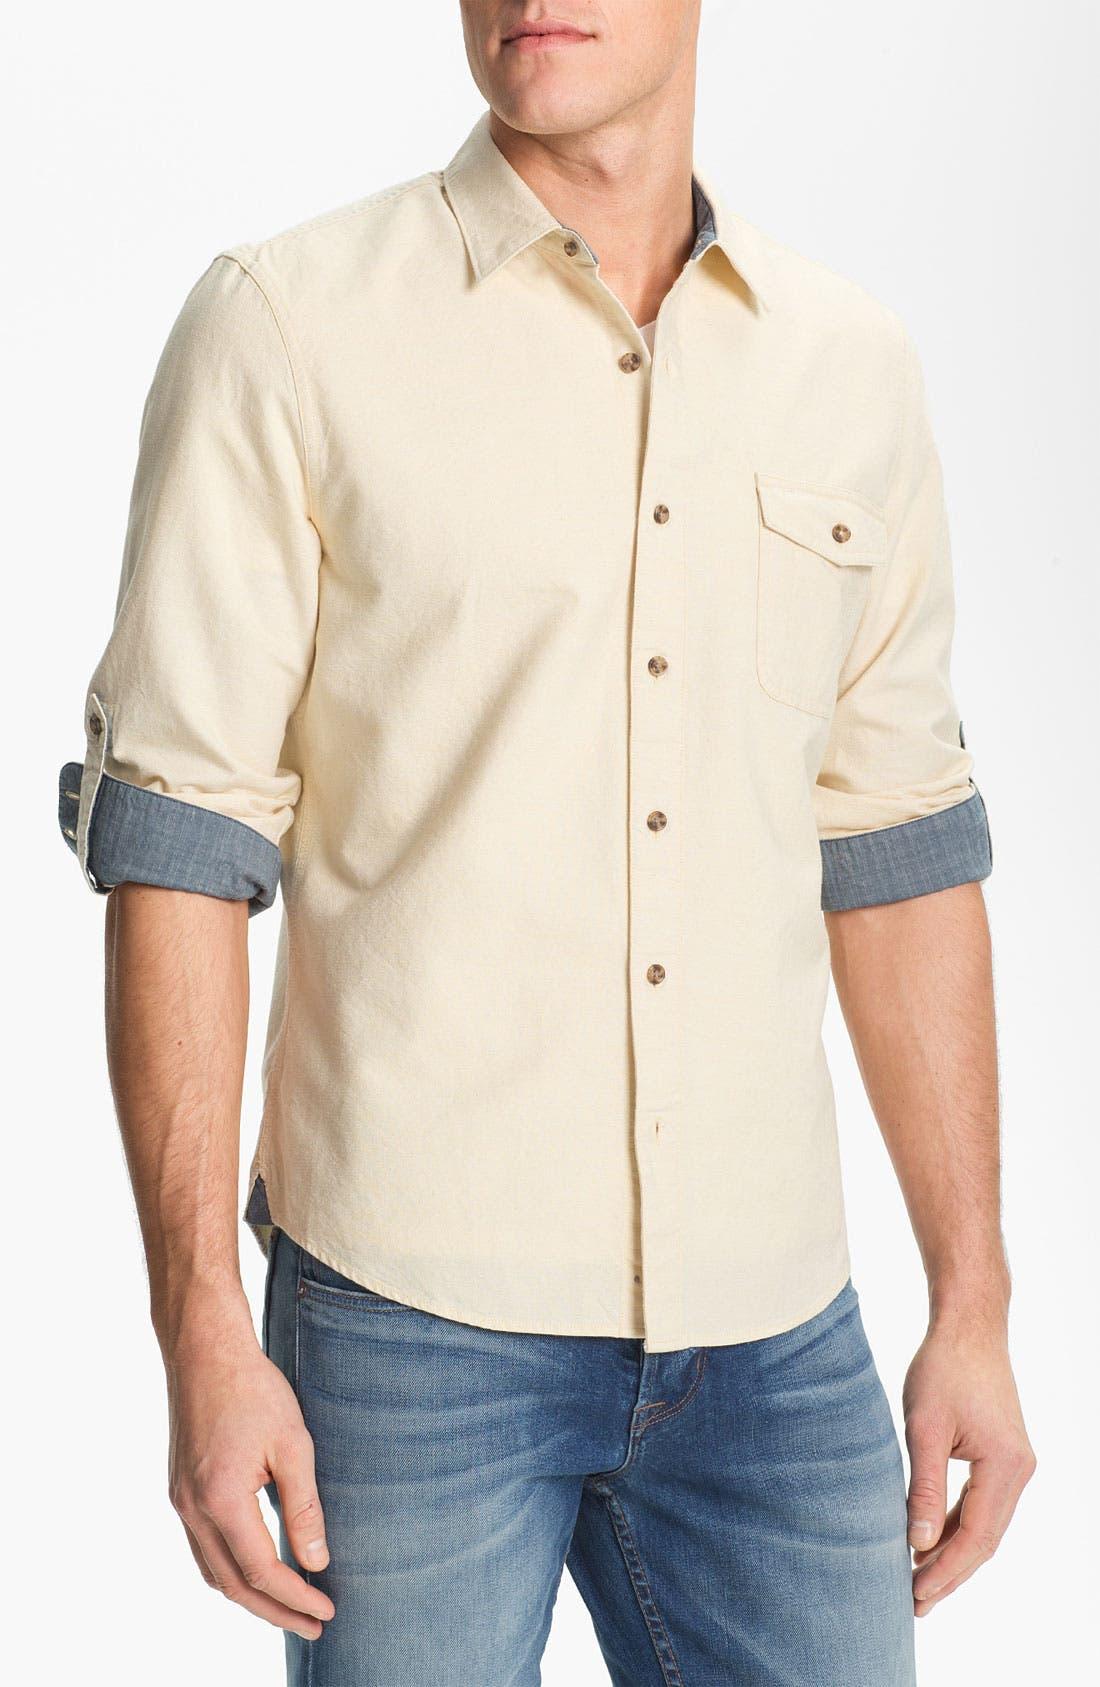 Alternate Image 1 Selected - 1901 Oxford Shirt